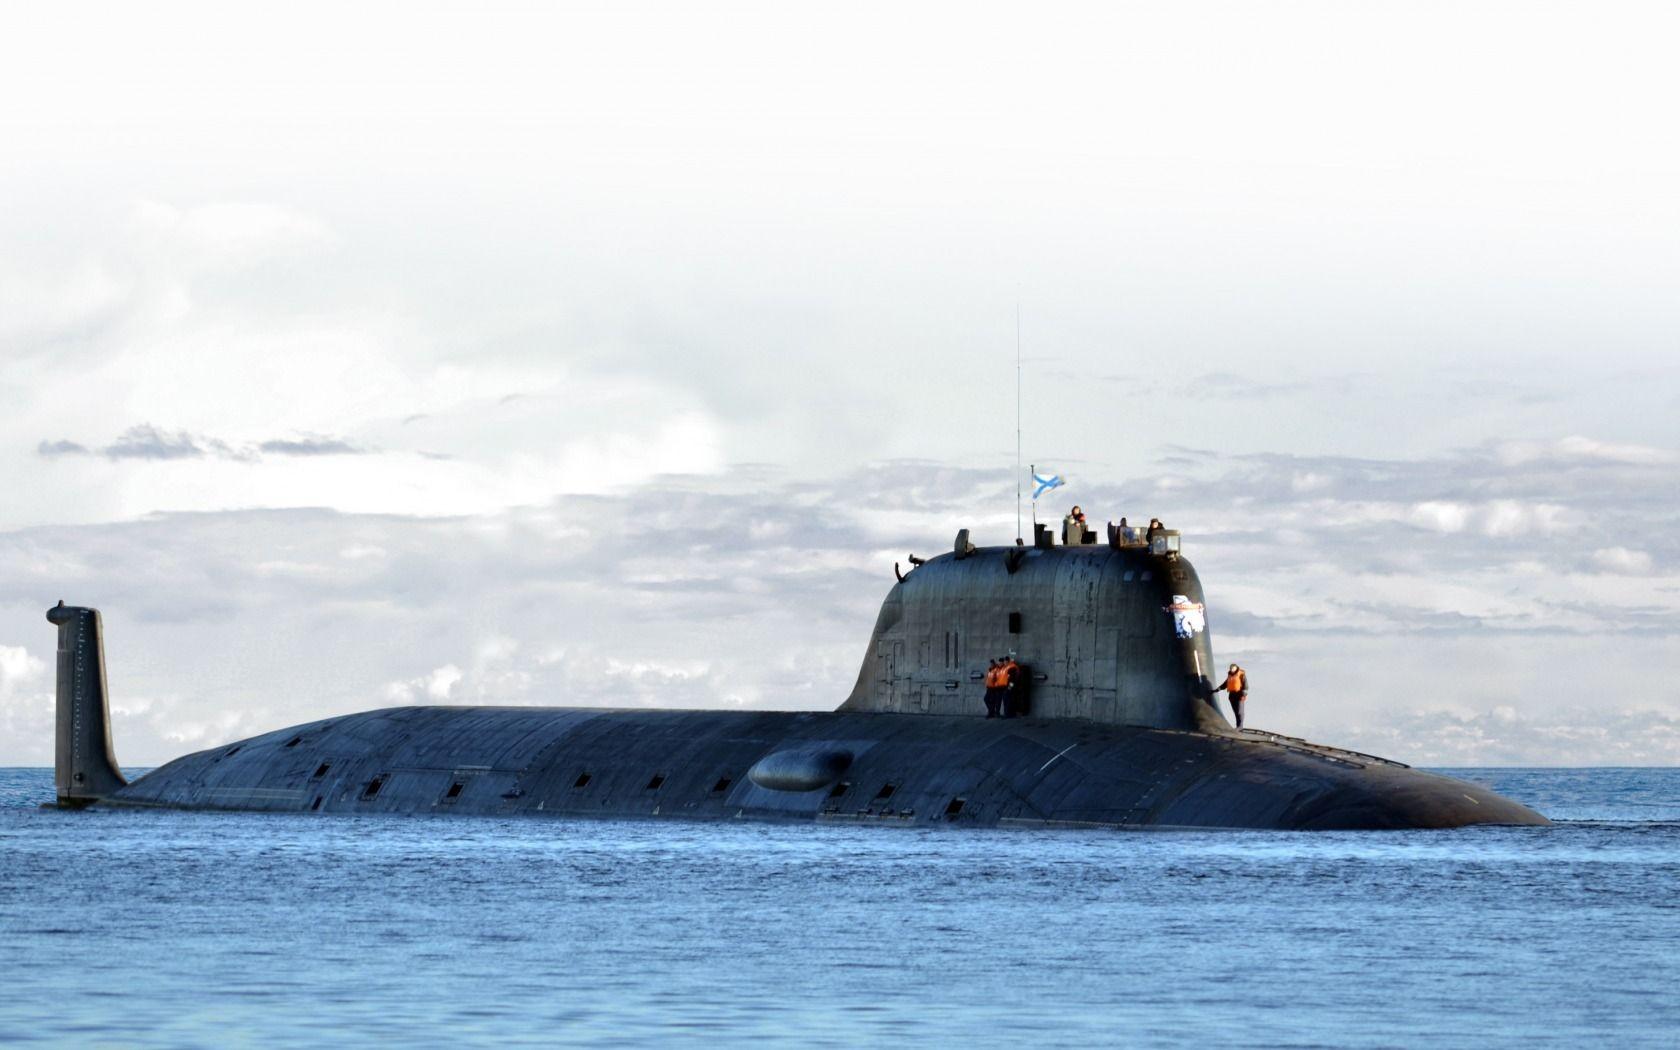 Papercraft Submarine Russian Yasen Class Submarine Severodvinsk K 329 [1680 1050